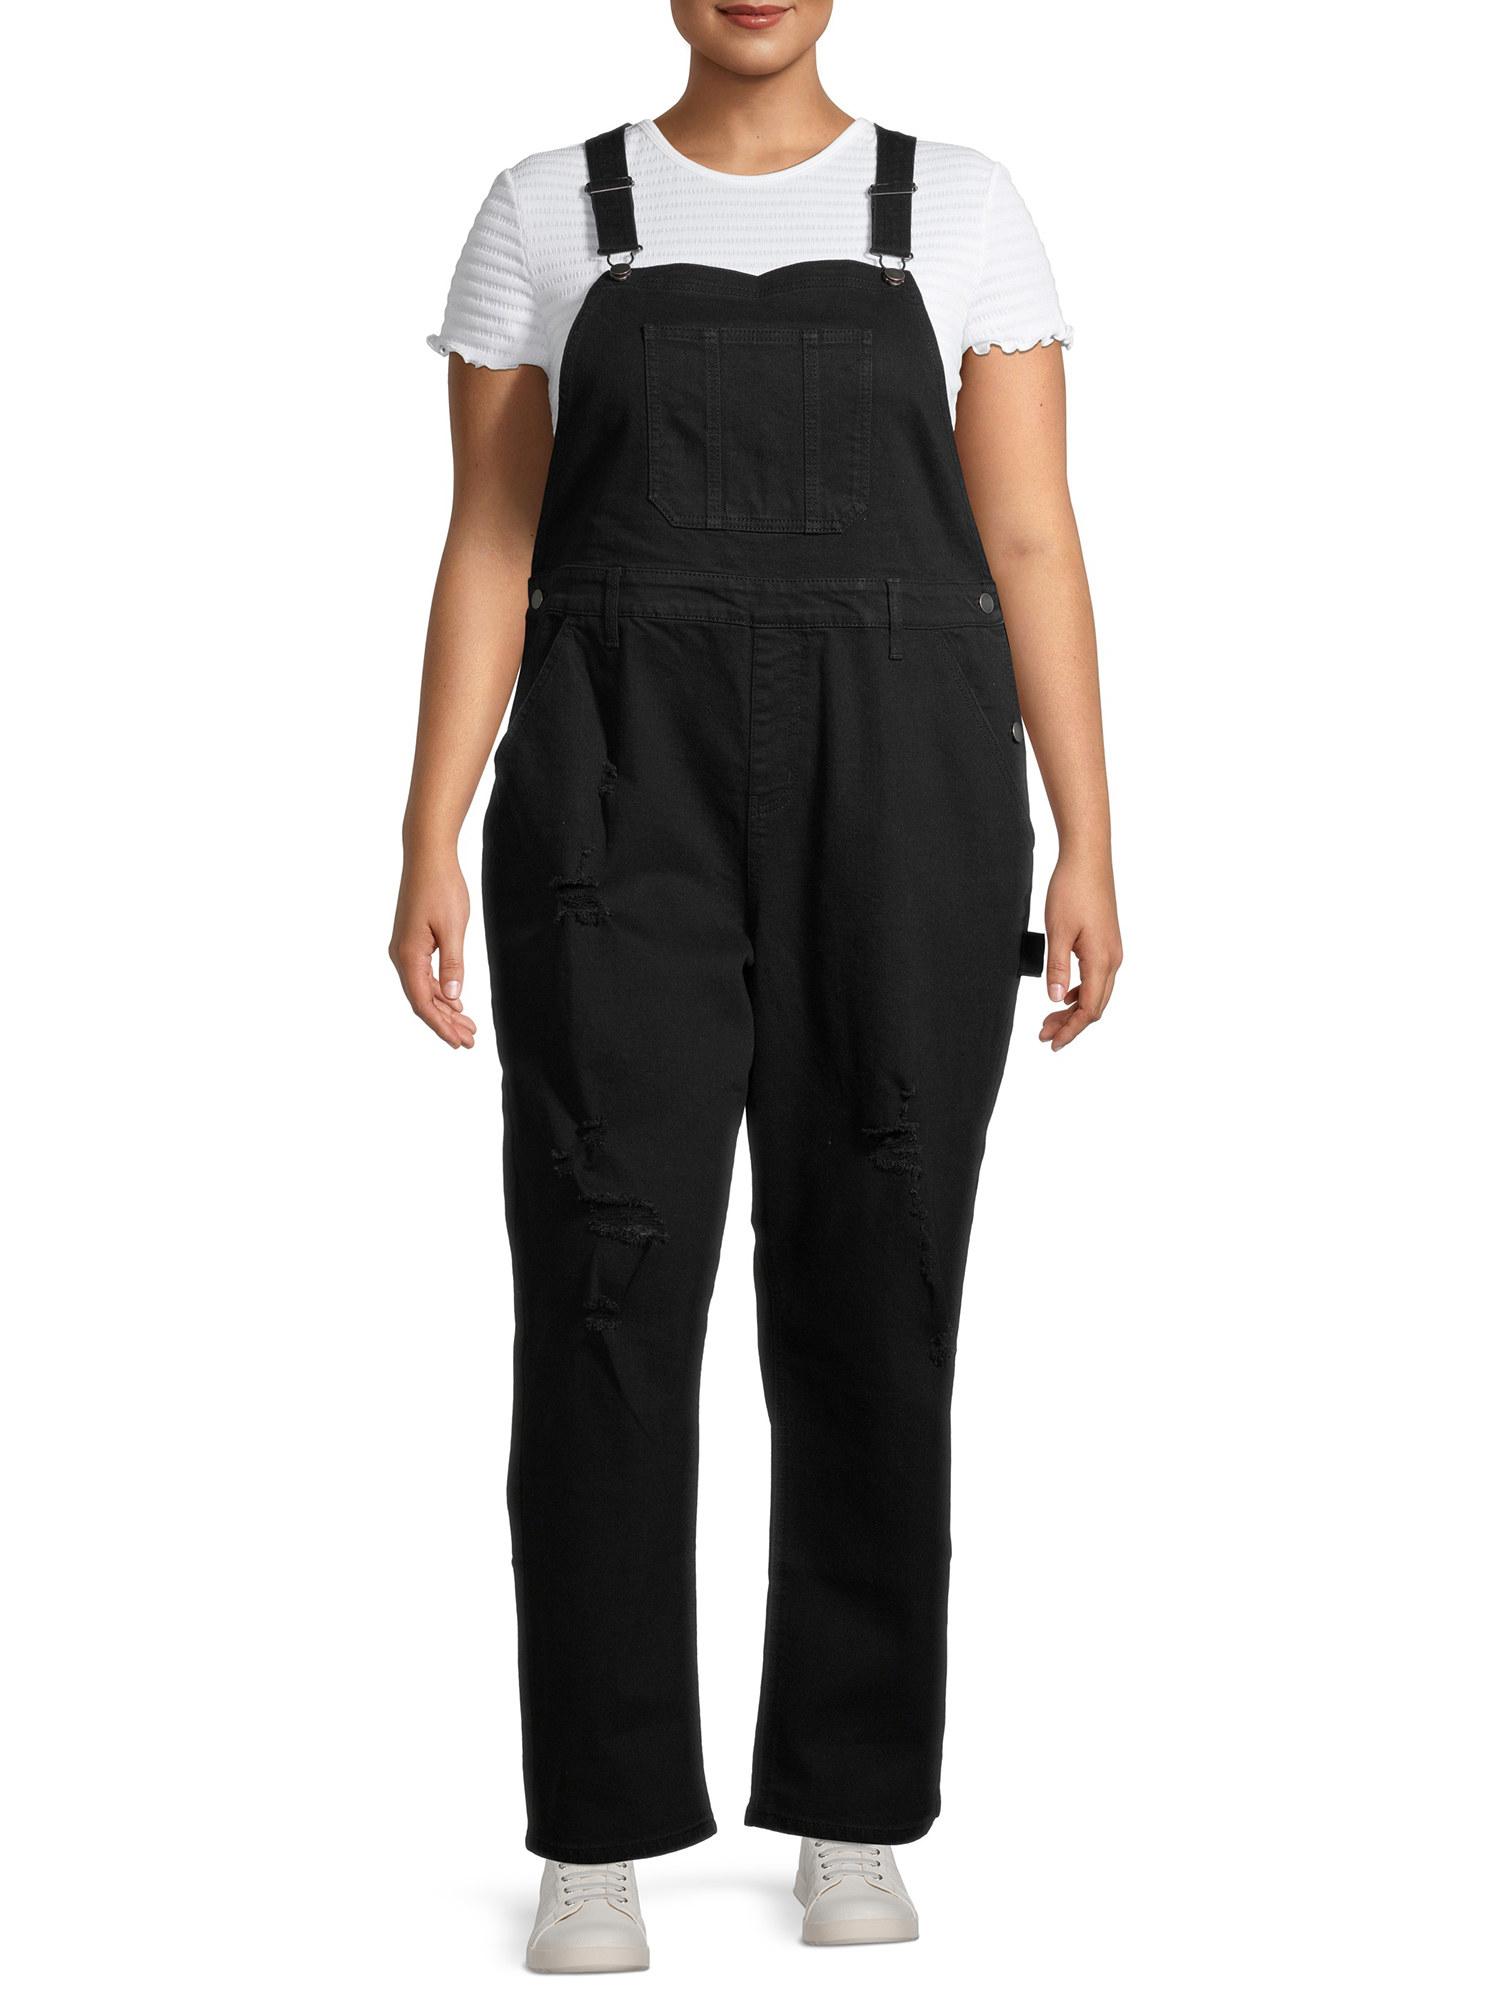 The black overalls